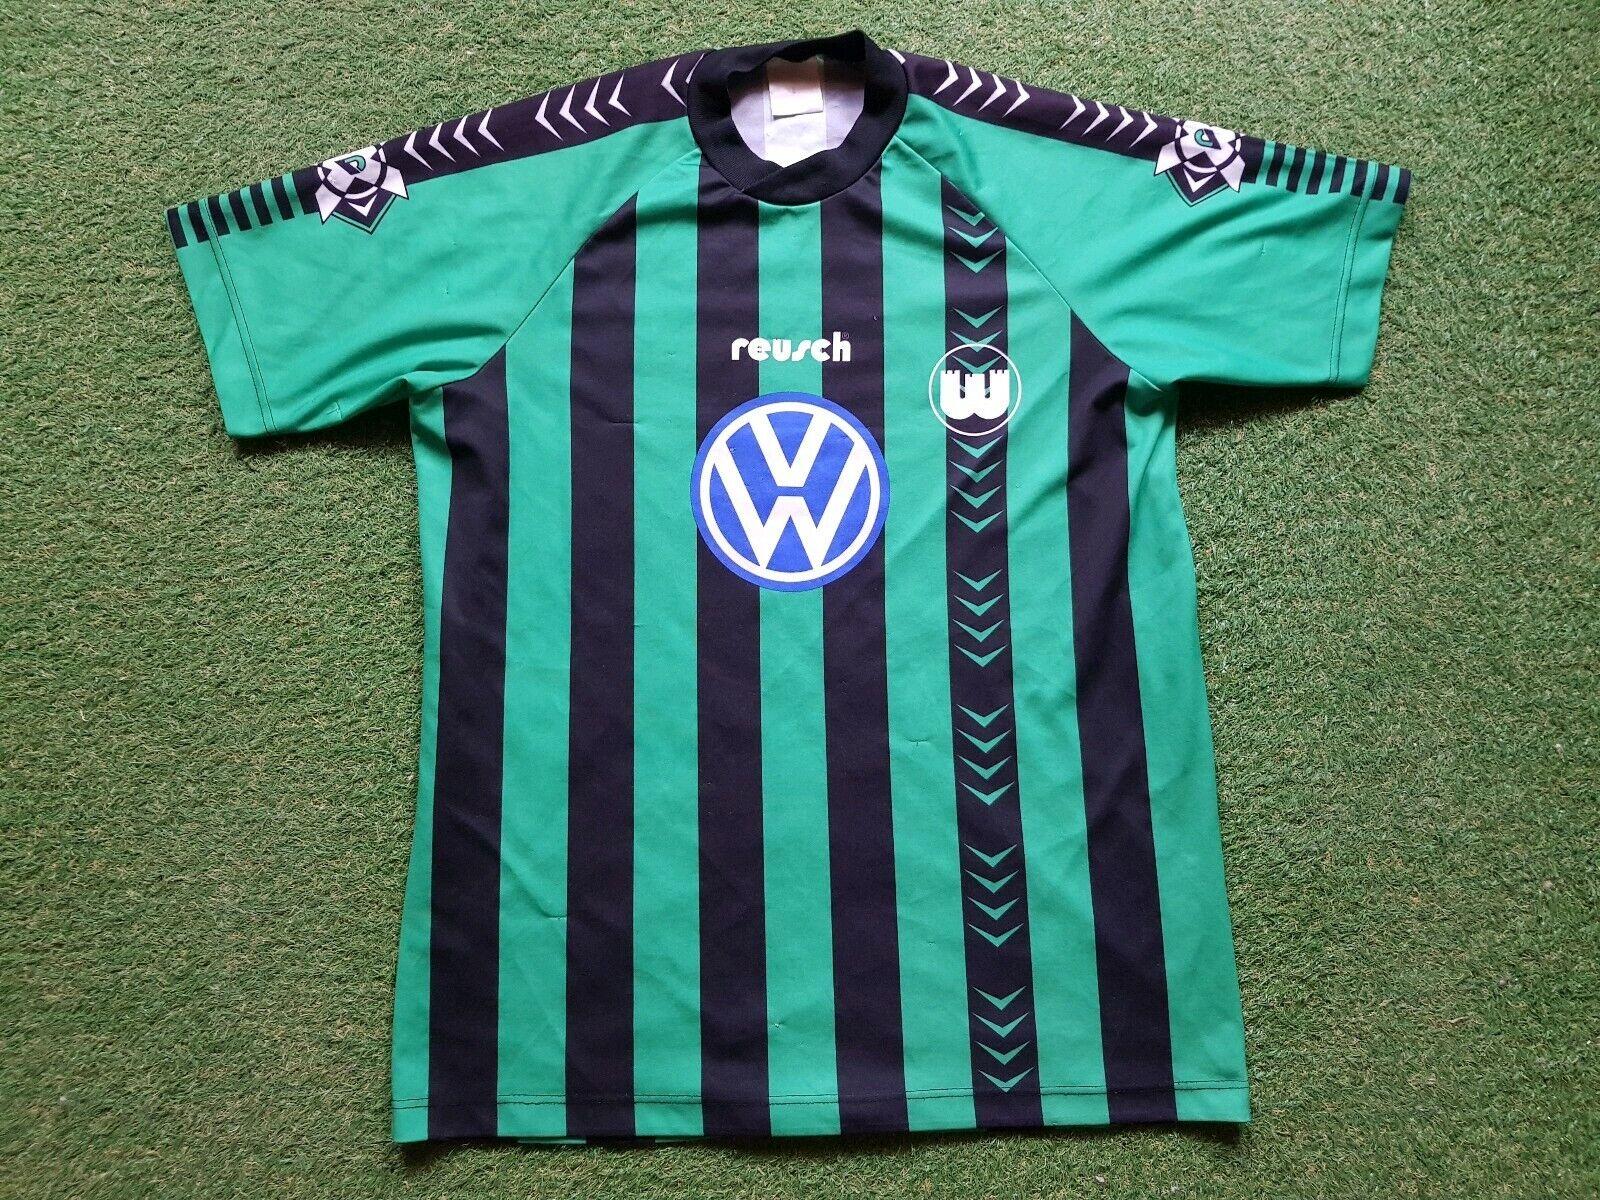 Vfl Wolfsburg Maglia XL 1994 1995 Reusch Shirt VW DFB Coppa Finale